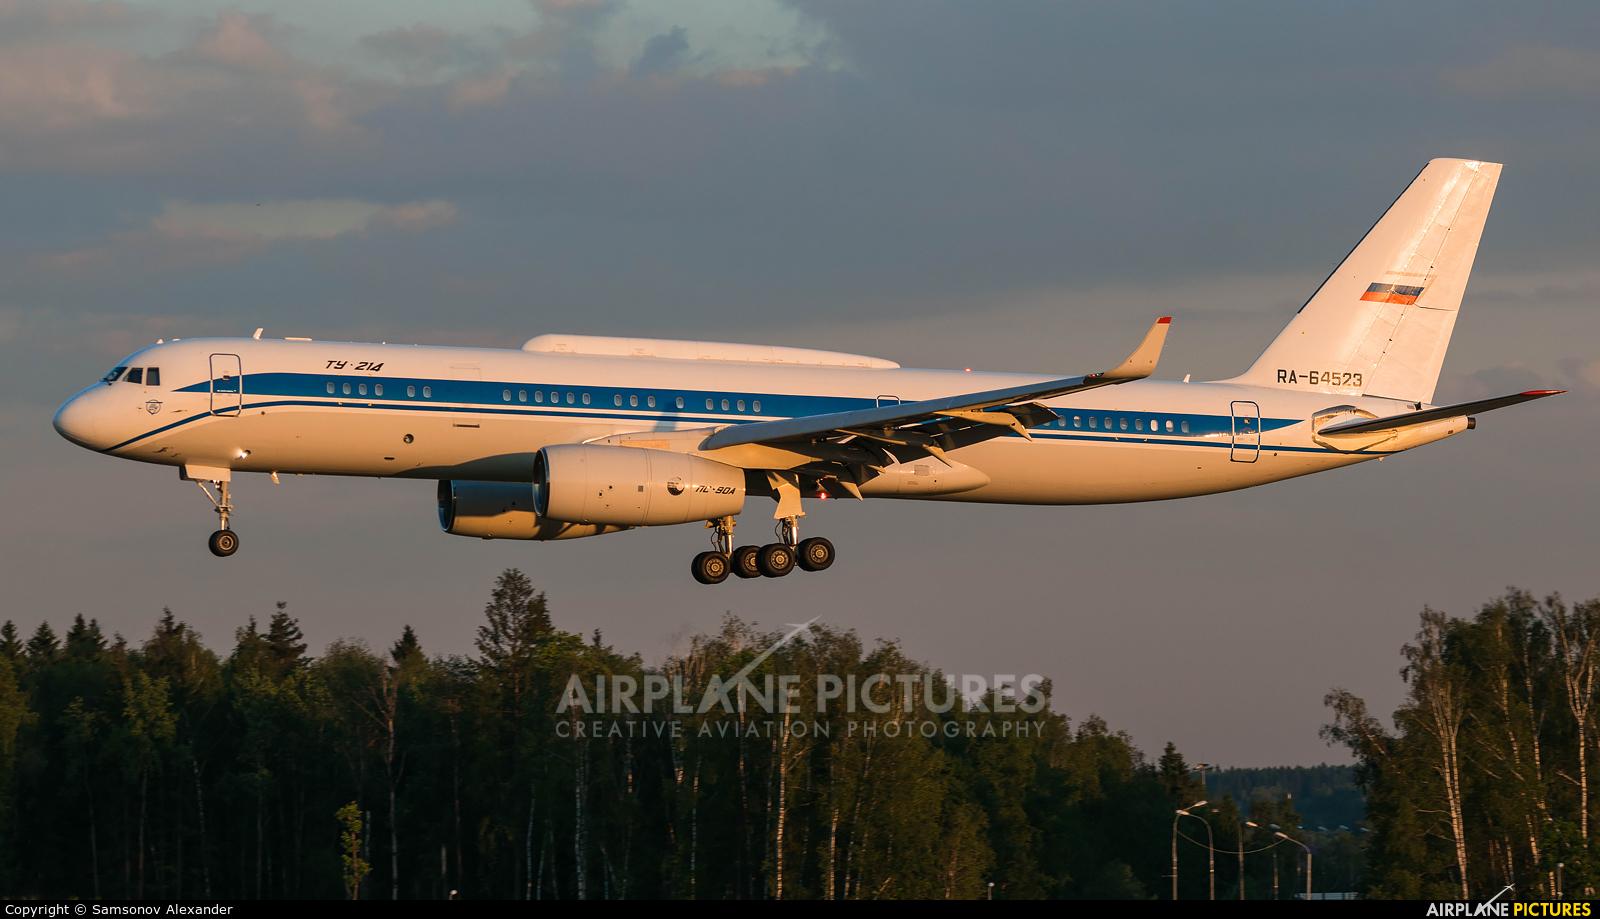 Russia - Government RA-64523 aircraft at Moscow - Vnukovo